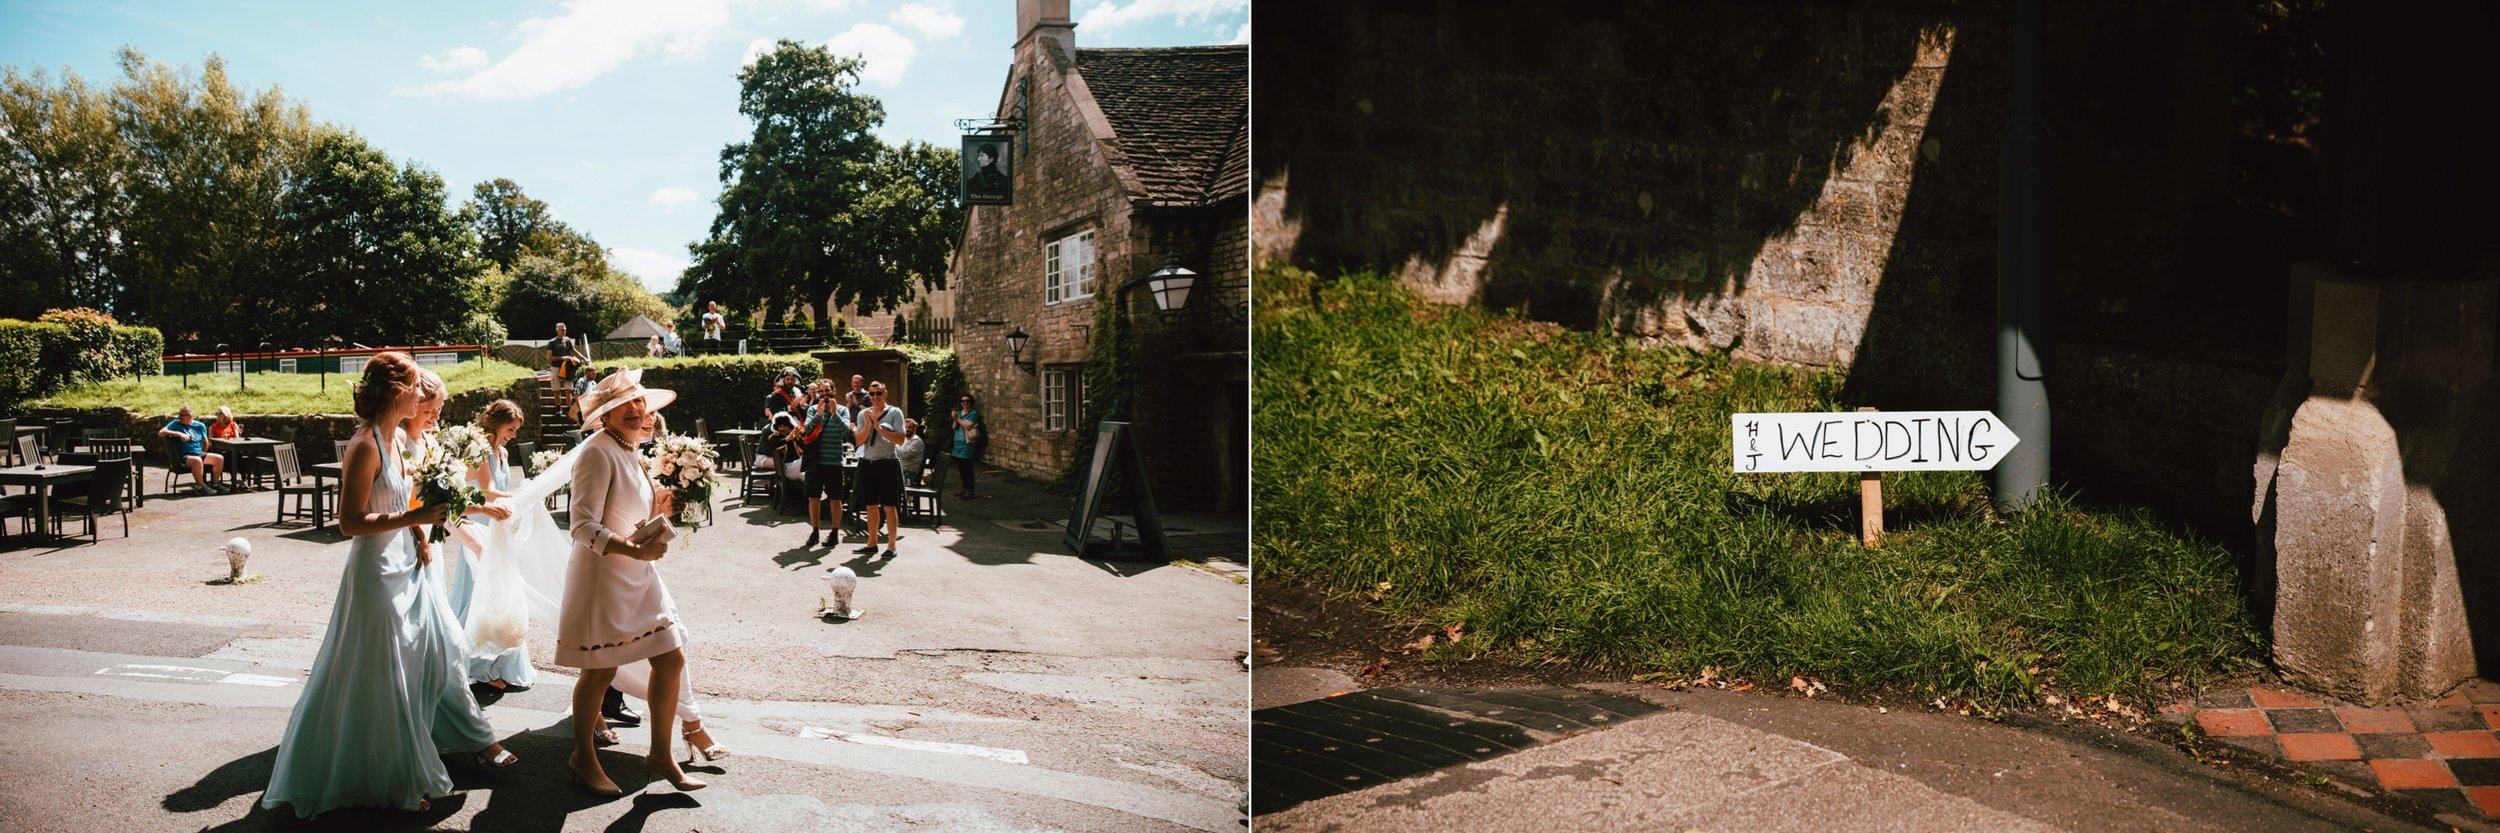 James & Hannah | Oak & Blossom0008.jpg